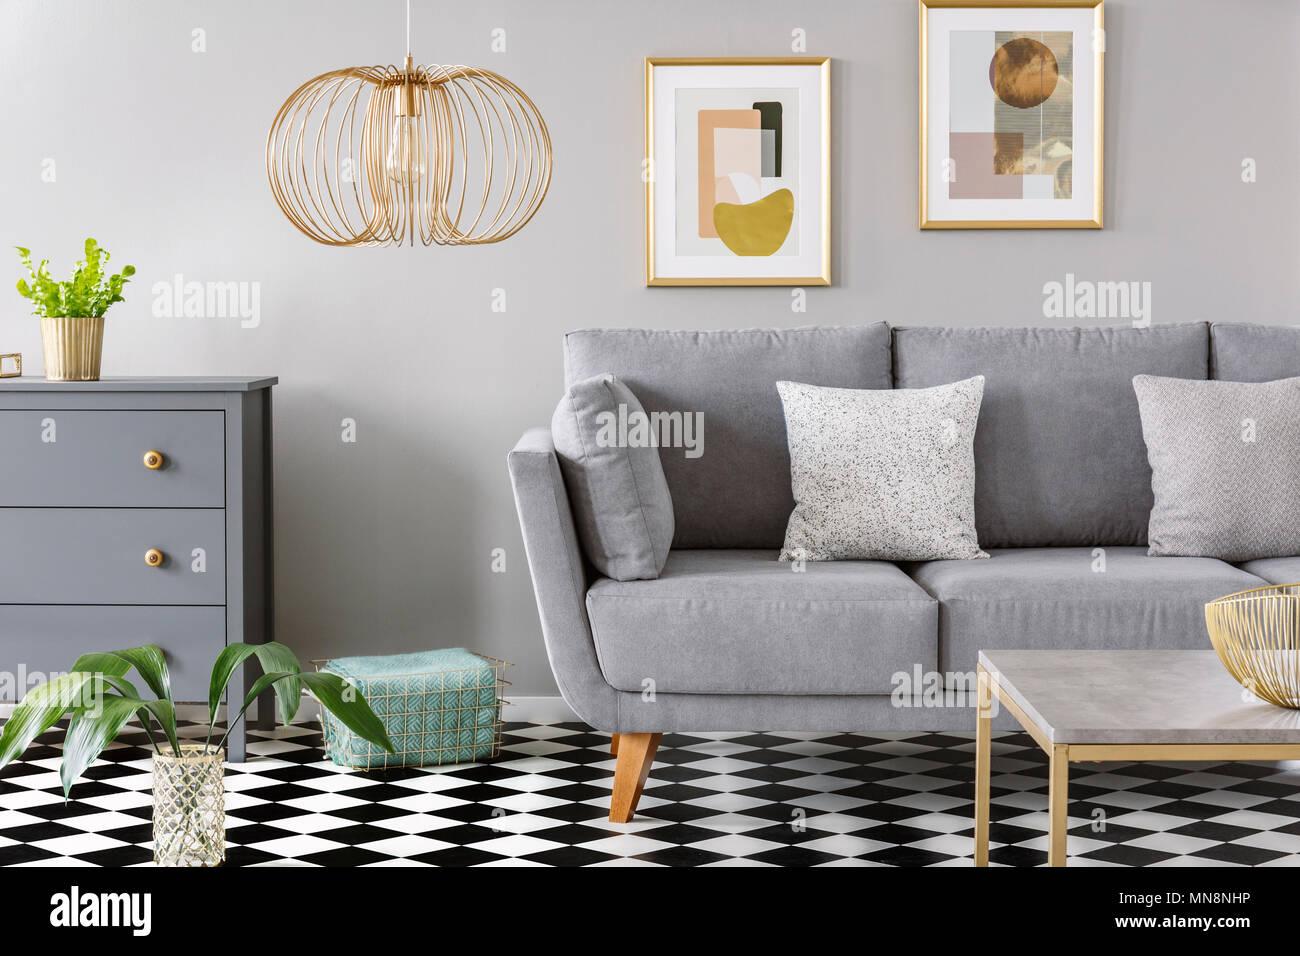 gold lampe in grau wohnzimmer interieur mit poster ber. Black Bedroom Furniture Sets. Home Design Ideas